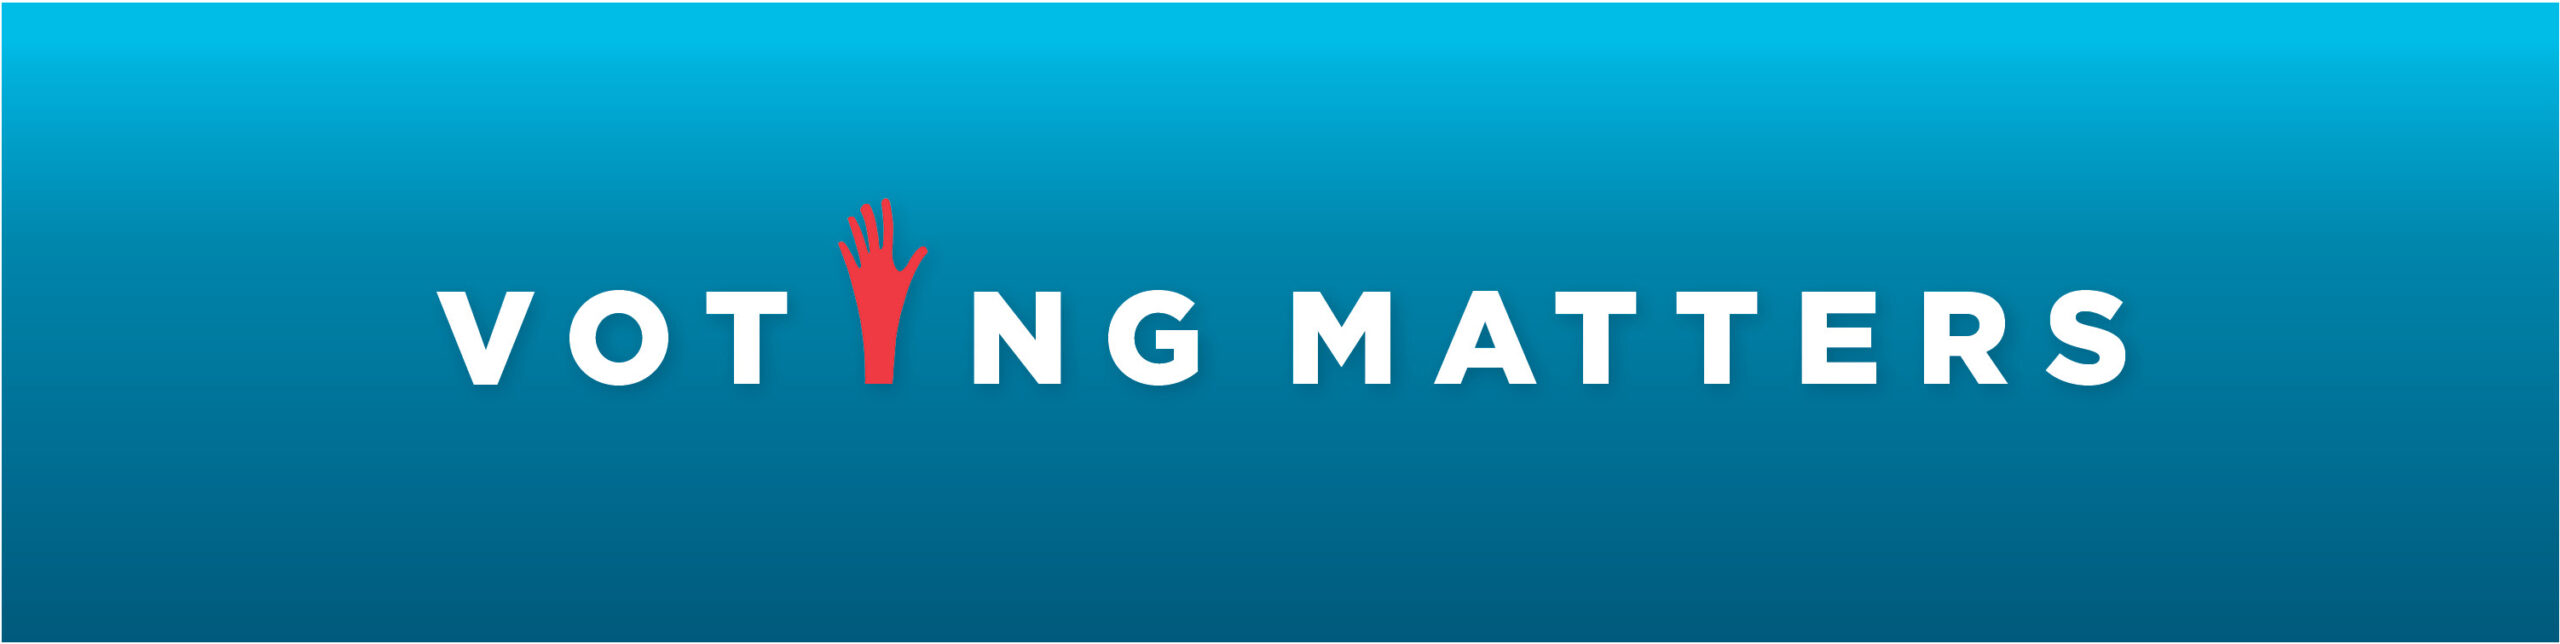 Voting Matters a_Web_LG 72dpi